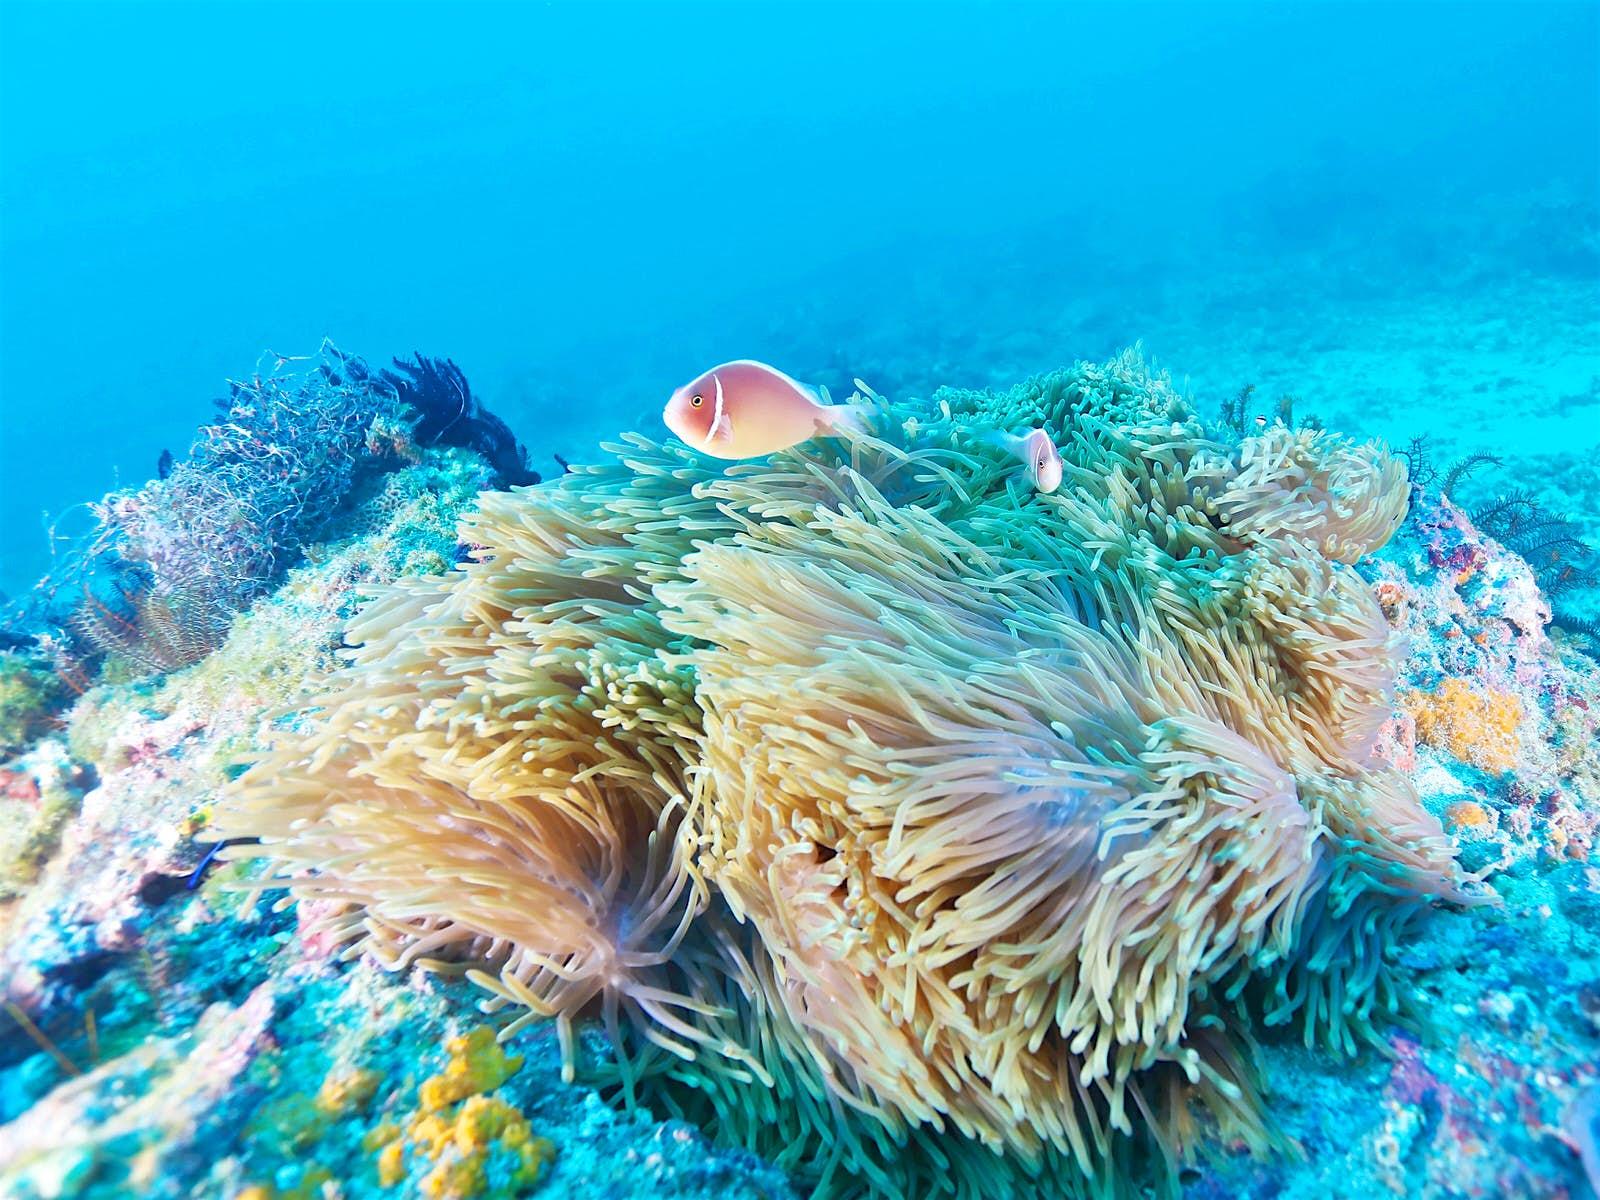 Pink skunk clownfish swims next to a sea anemone amongst Little Liuchiu's rich marine life © unterwegs / Shutterstock